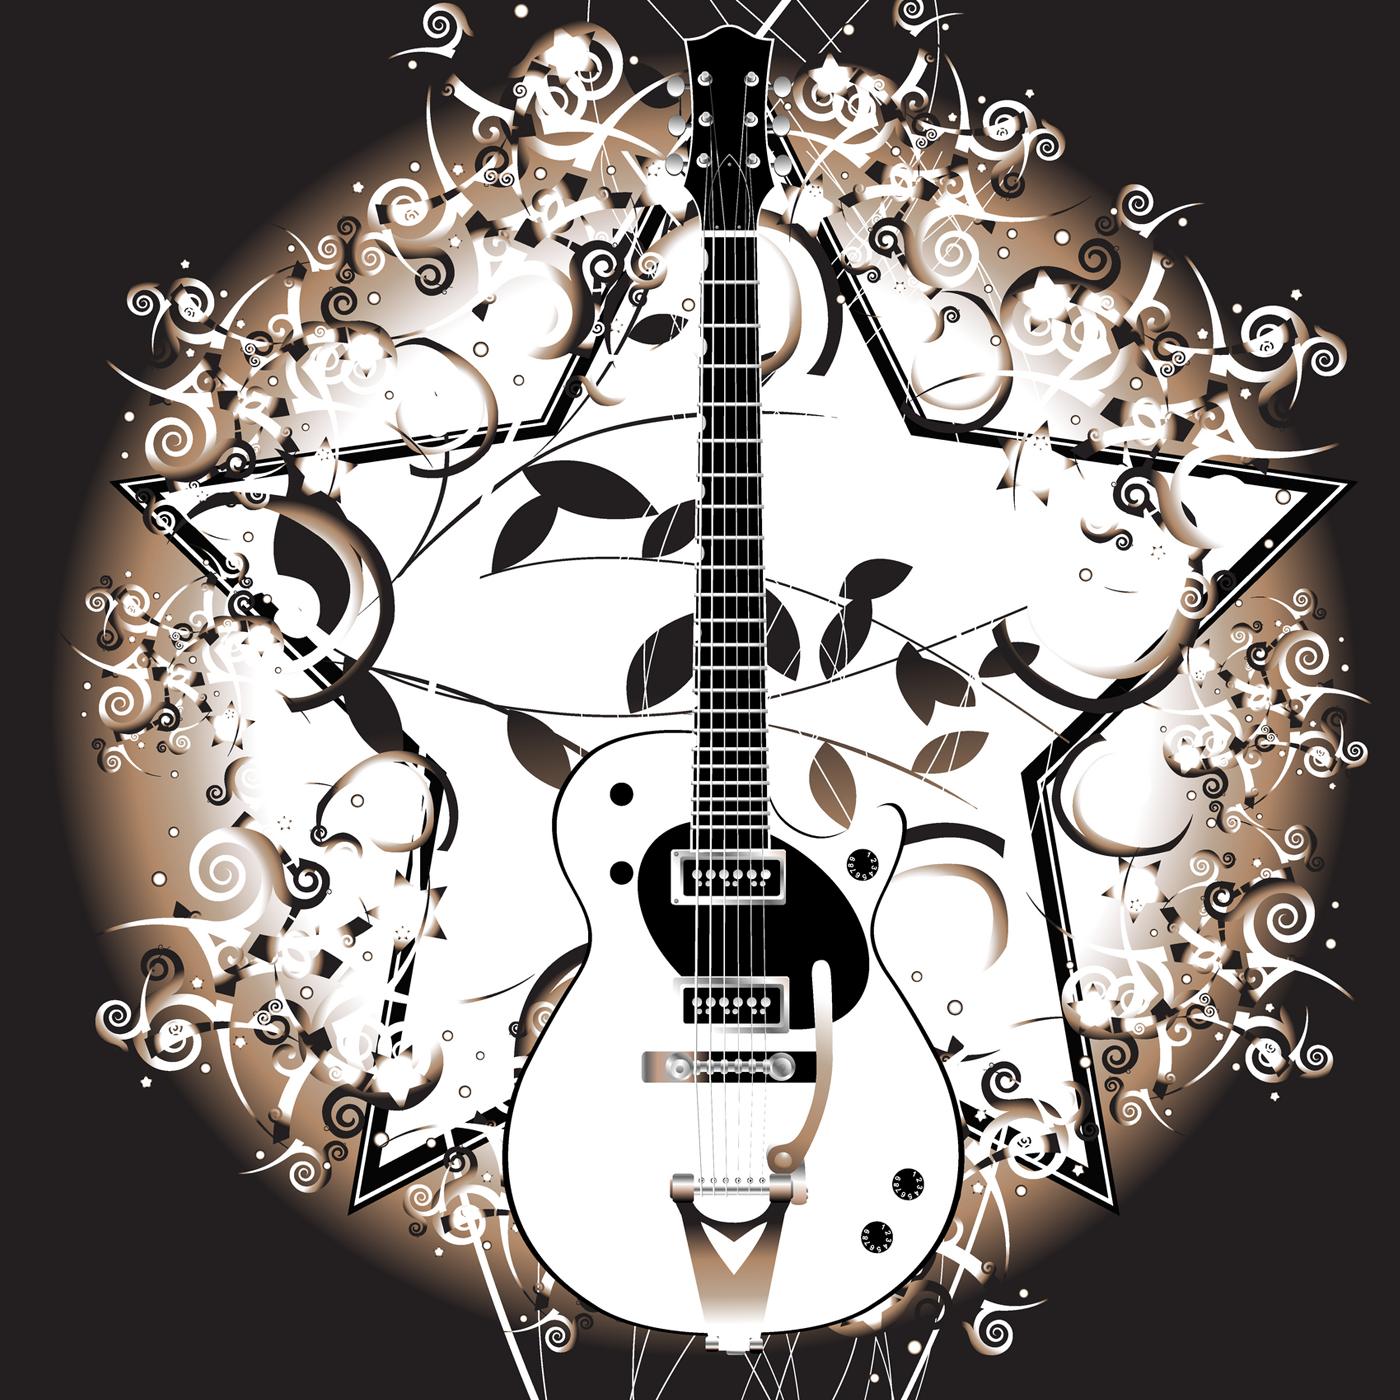 hard rock on rockradio com rockradio com rock music for life. Black Bedroom Furniture Sets. Home Design Ideas